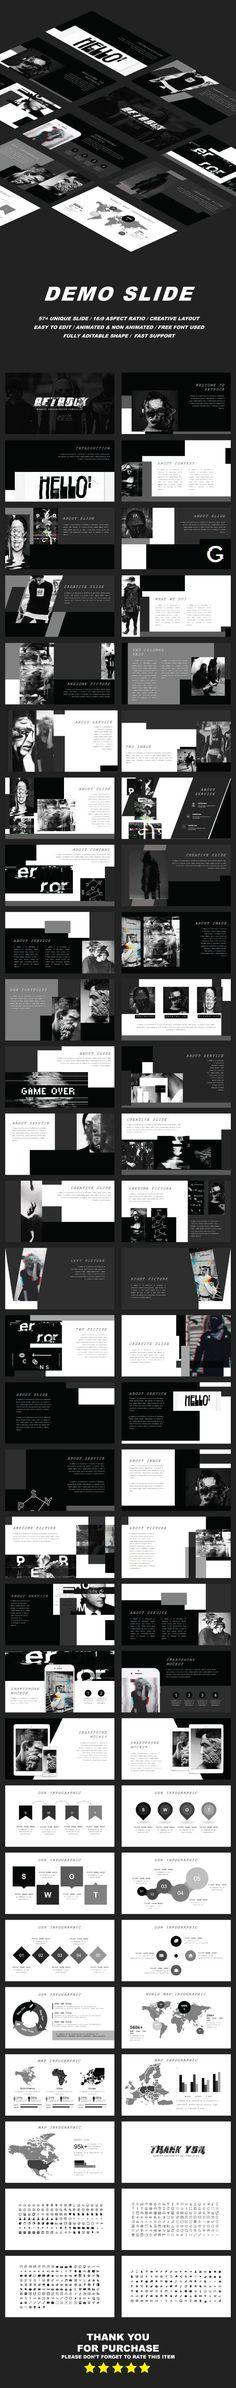 Retrock Presentation Templates Abstract Presentation by CreatorTemplate. Presentation Slides, Presentation Design, Presentation Templates, Business Powerpoint Templates, Keynote Template, Typography Design, Logo Design, Graphic Design, Brochure Design